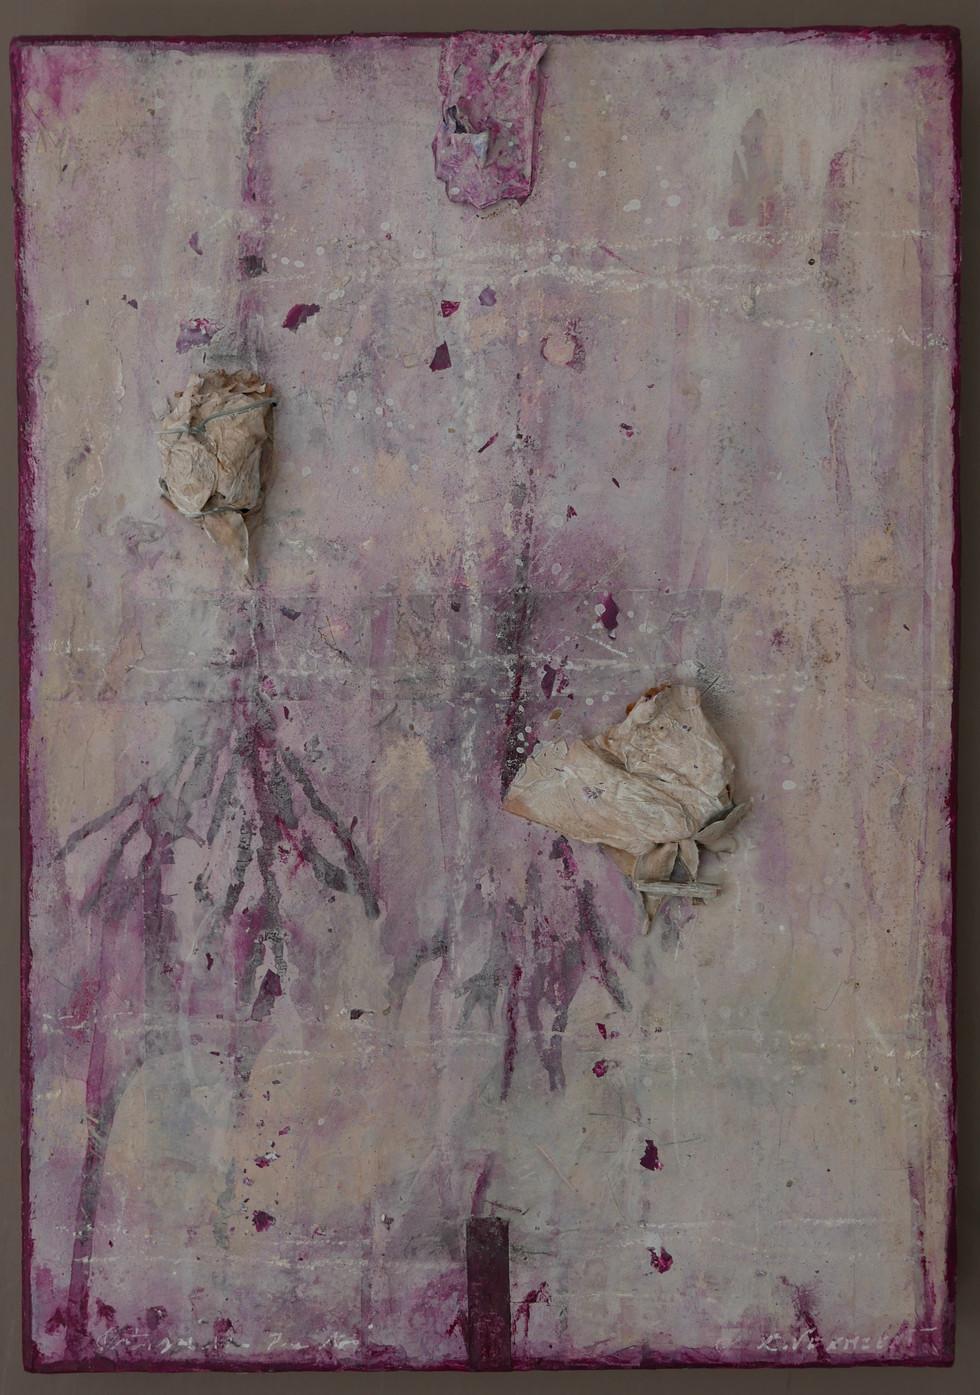 Ortigia(I),mixed media on canvas, 29x42cms, 2017